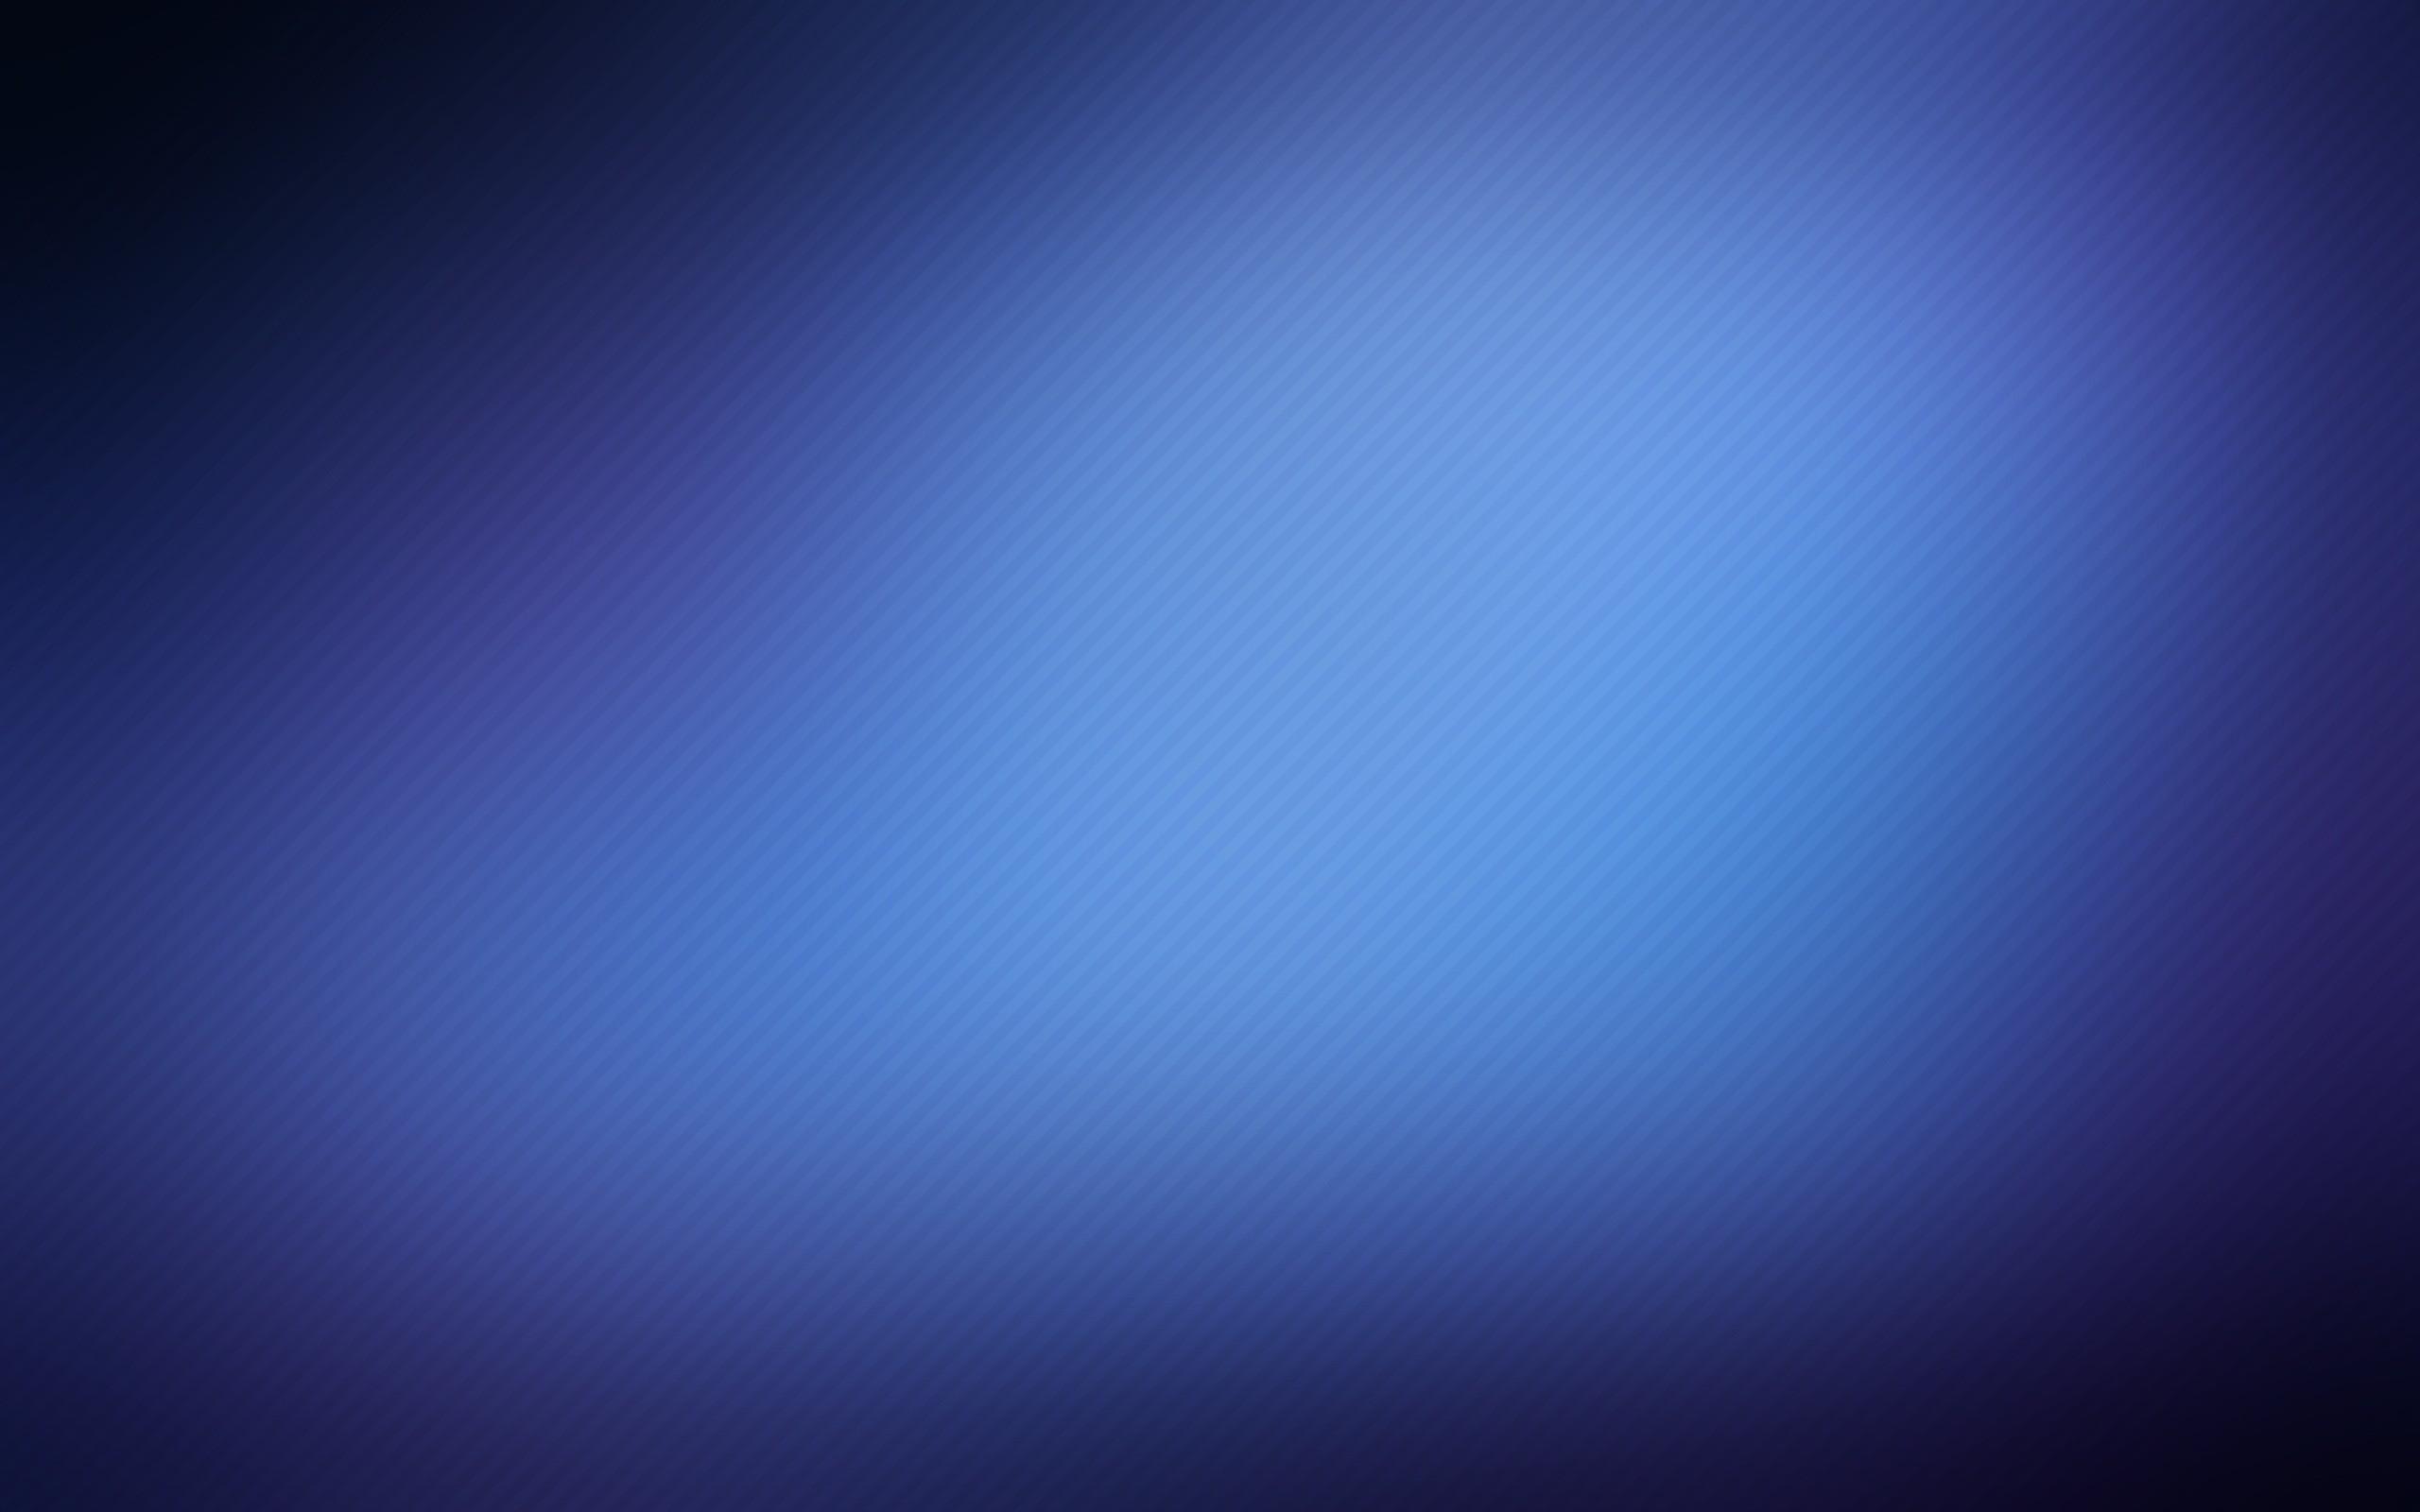 Plain Wallpapers – Full HD wallpaper search